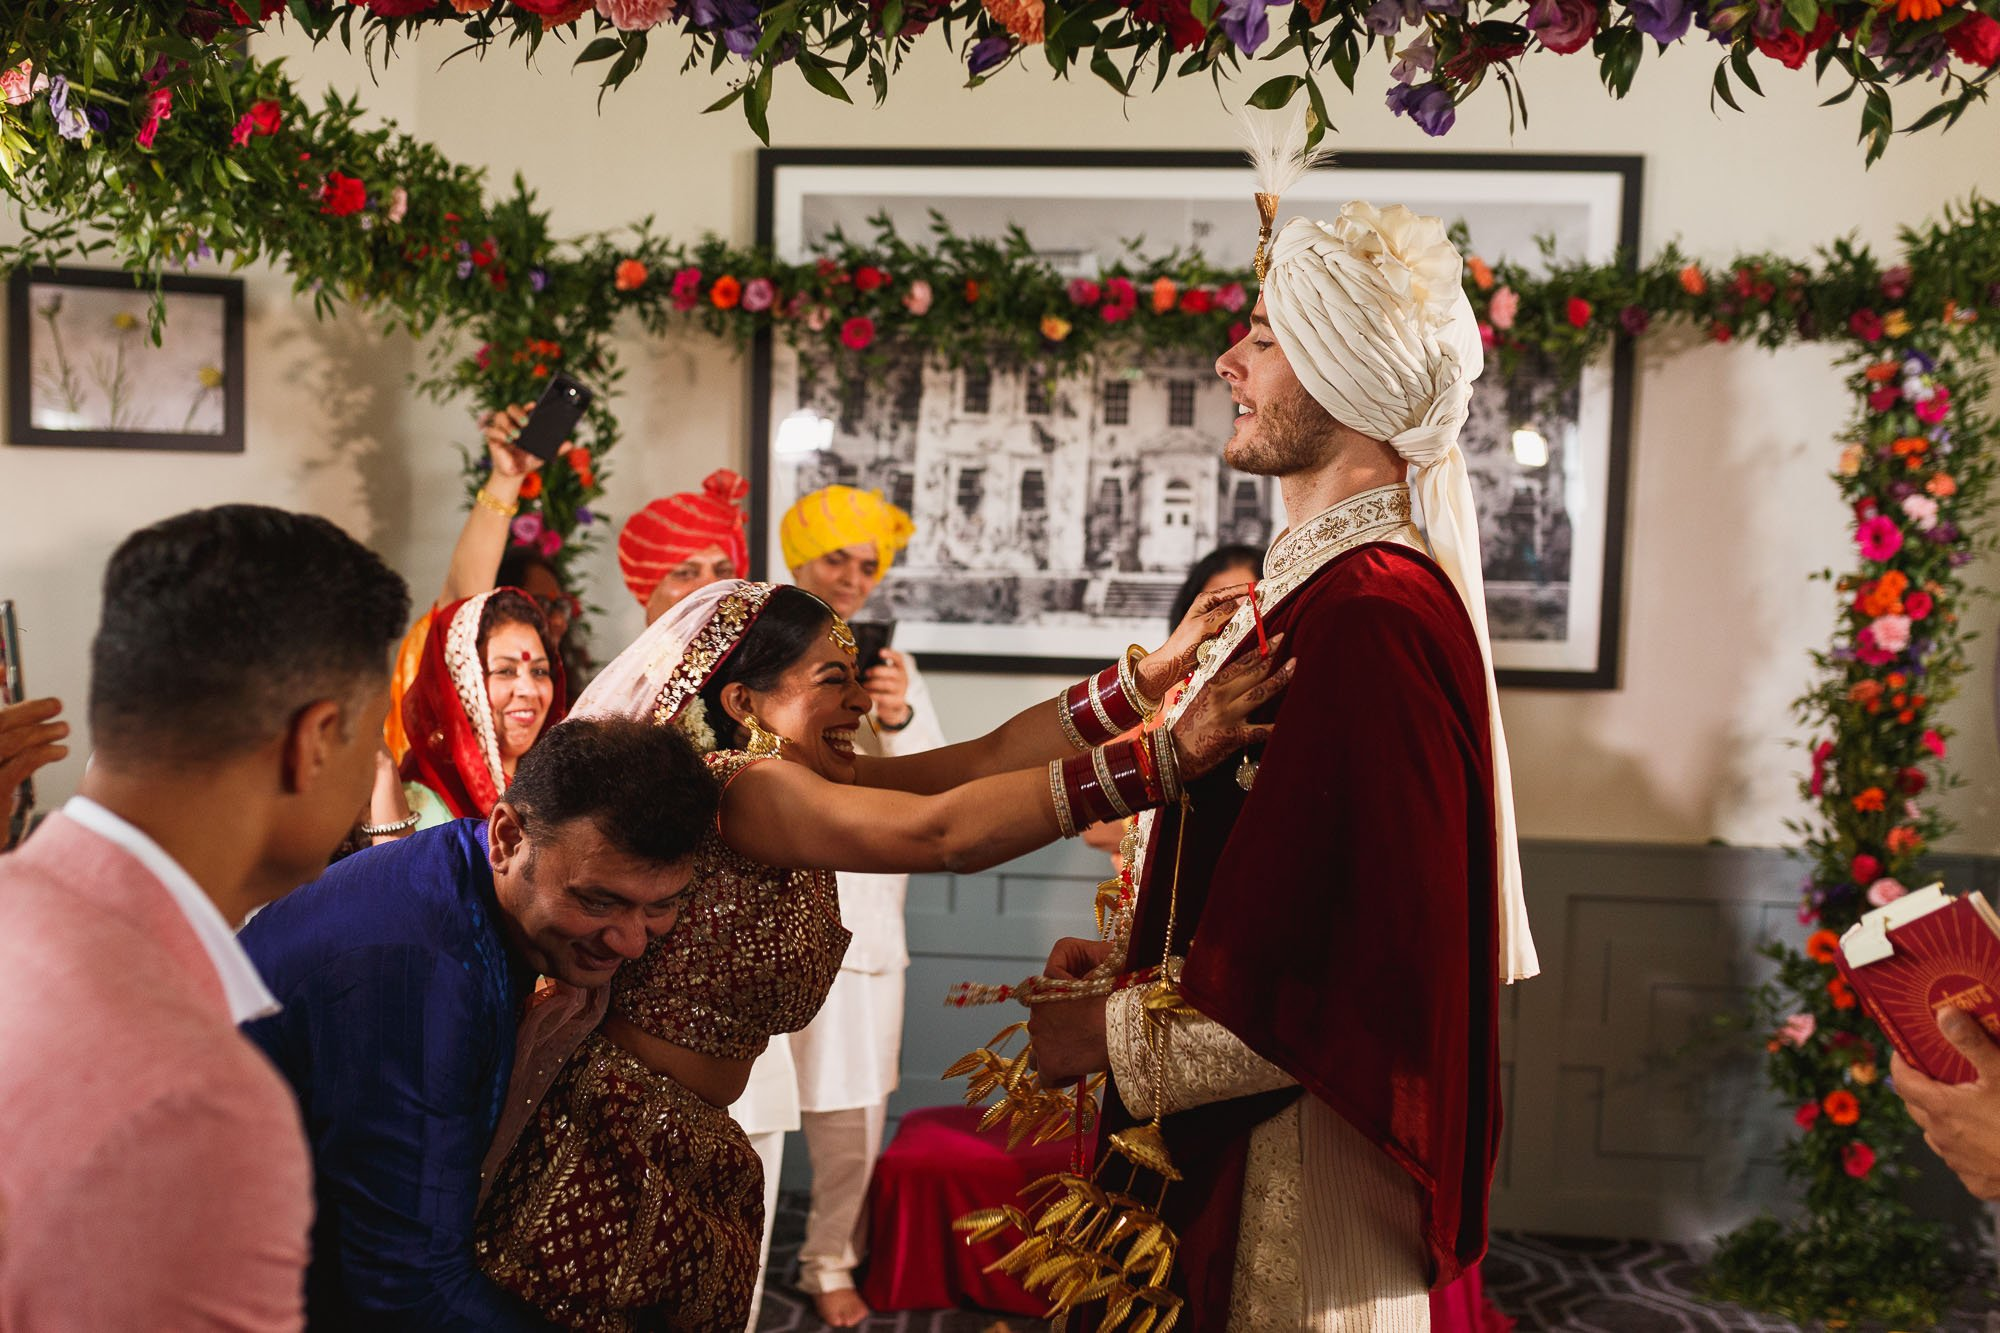 De Vere Wokefield Estate, Asian wedding photographer, hindu ceremony, mandap